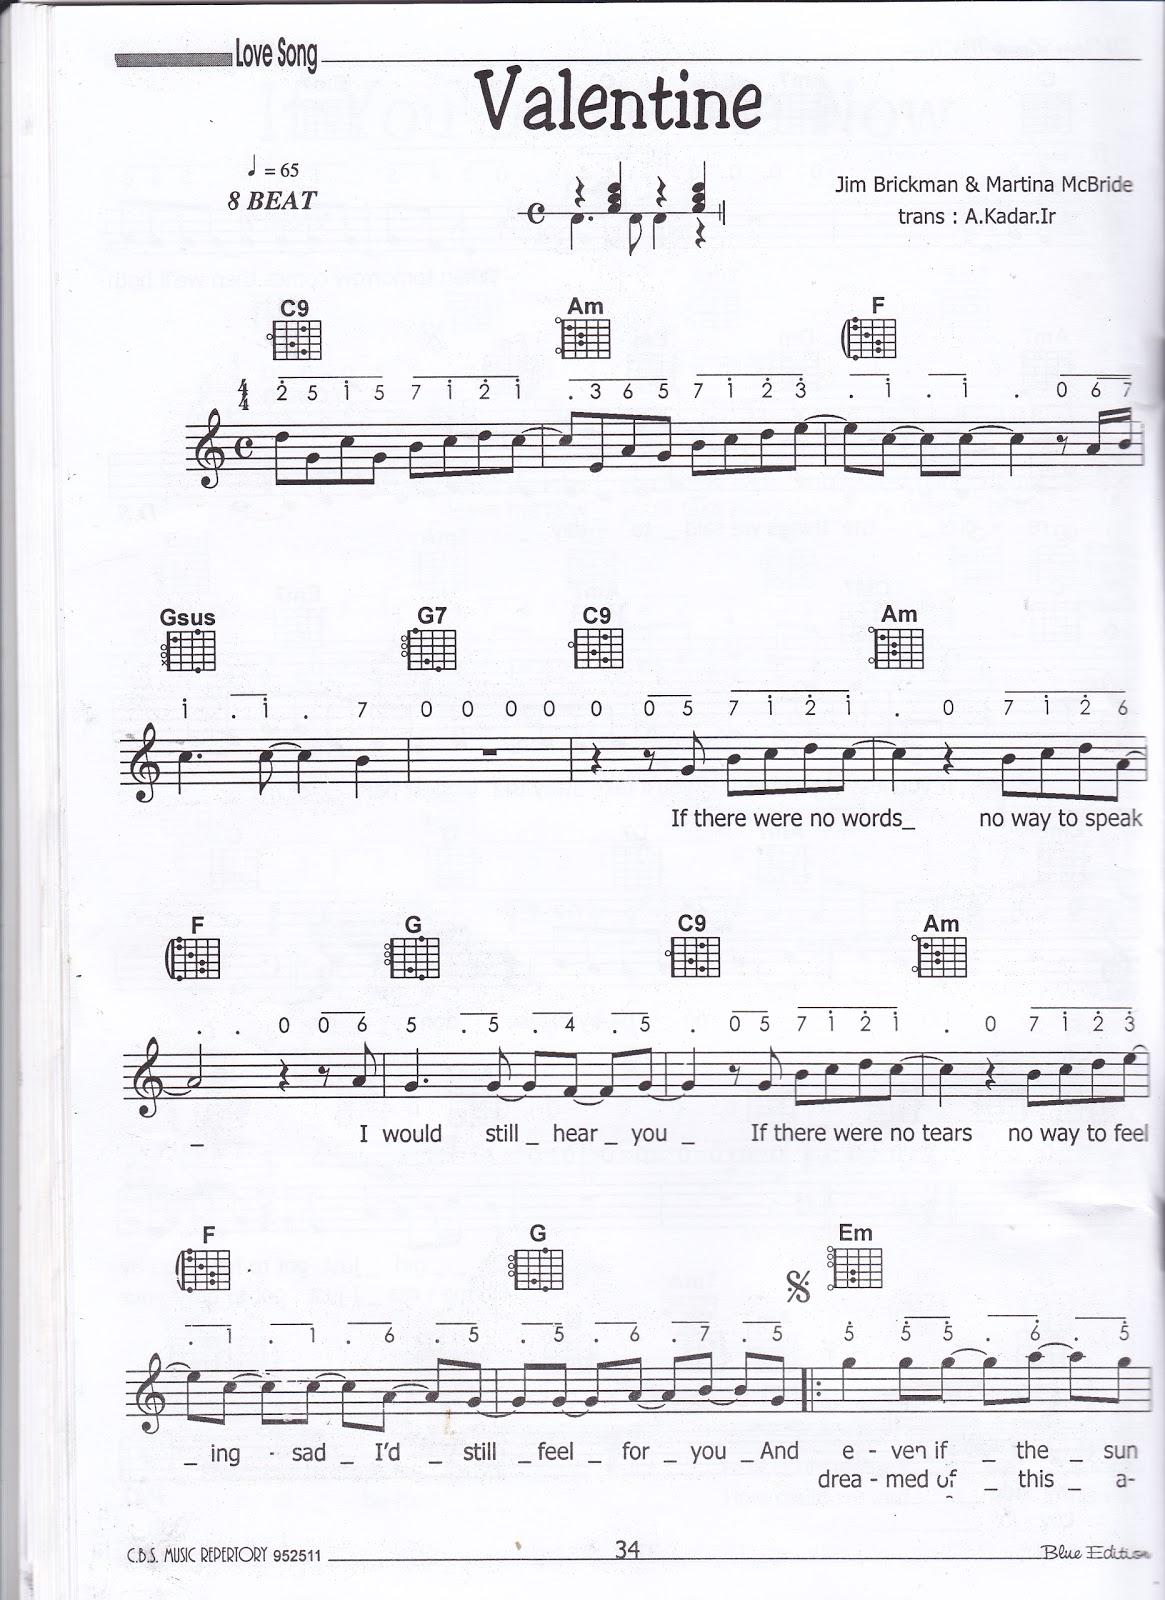 Piano ungu chord piano valentine jim brickman martina mcbride chord piano valentine jim brickman martina mcbride hexwebz Images